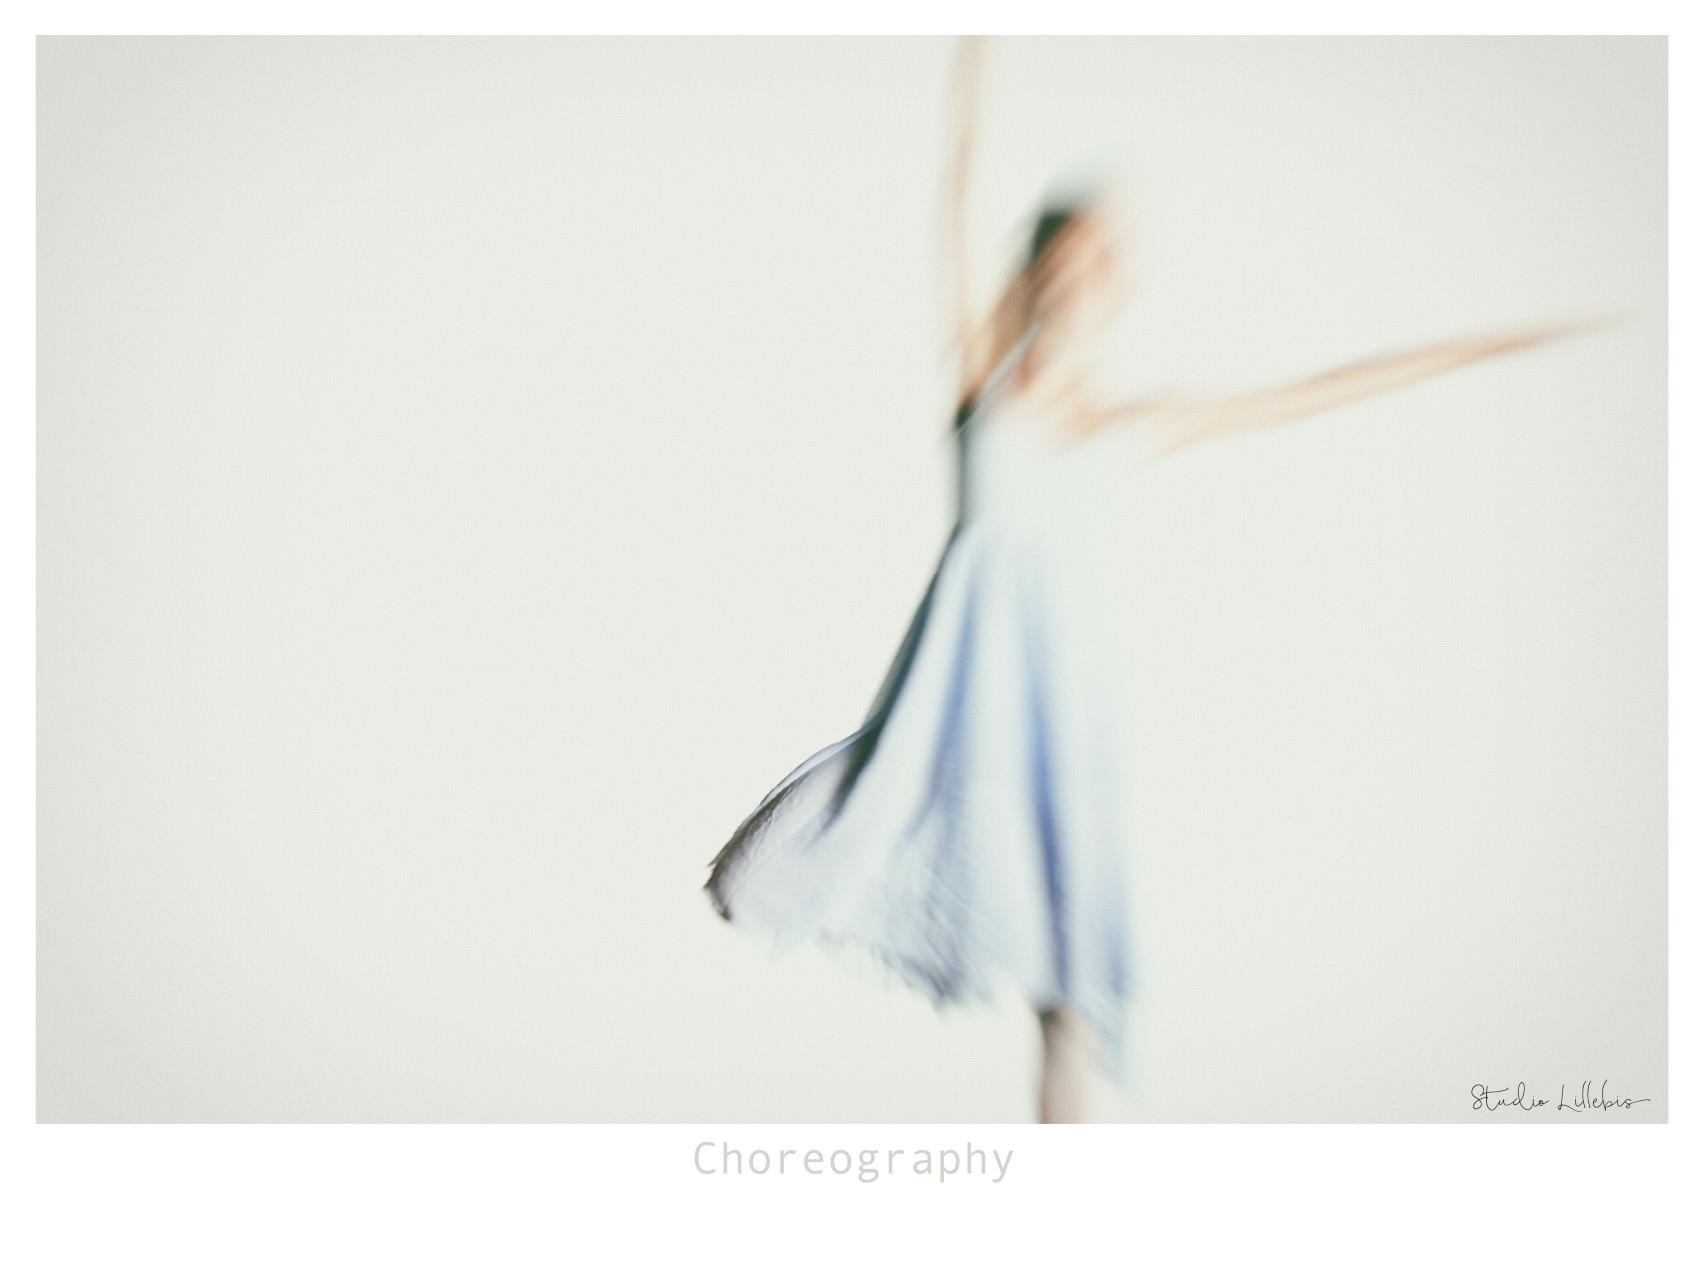 Choreography-30x40x